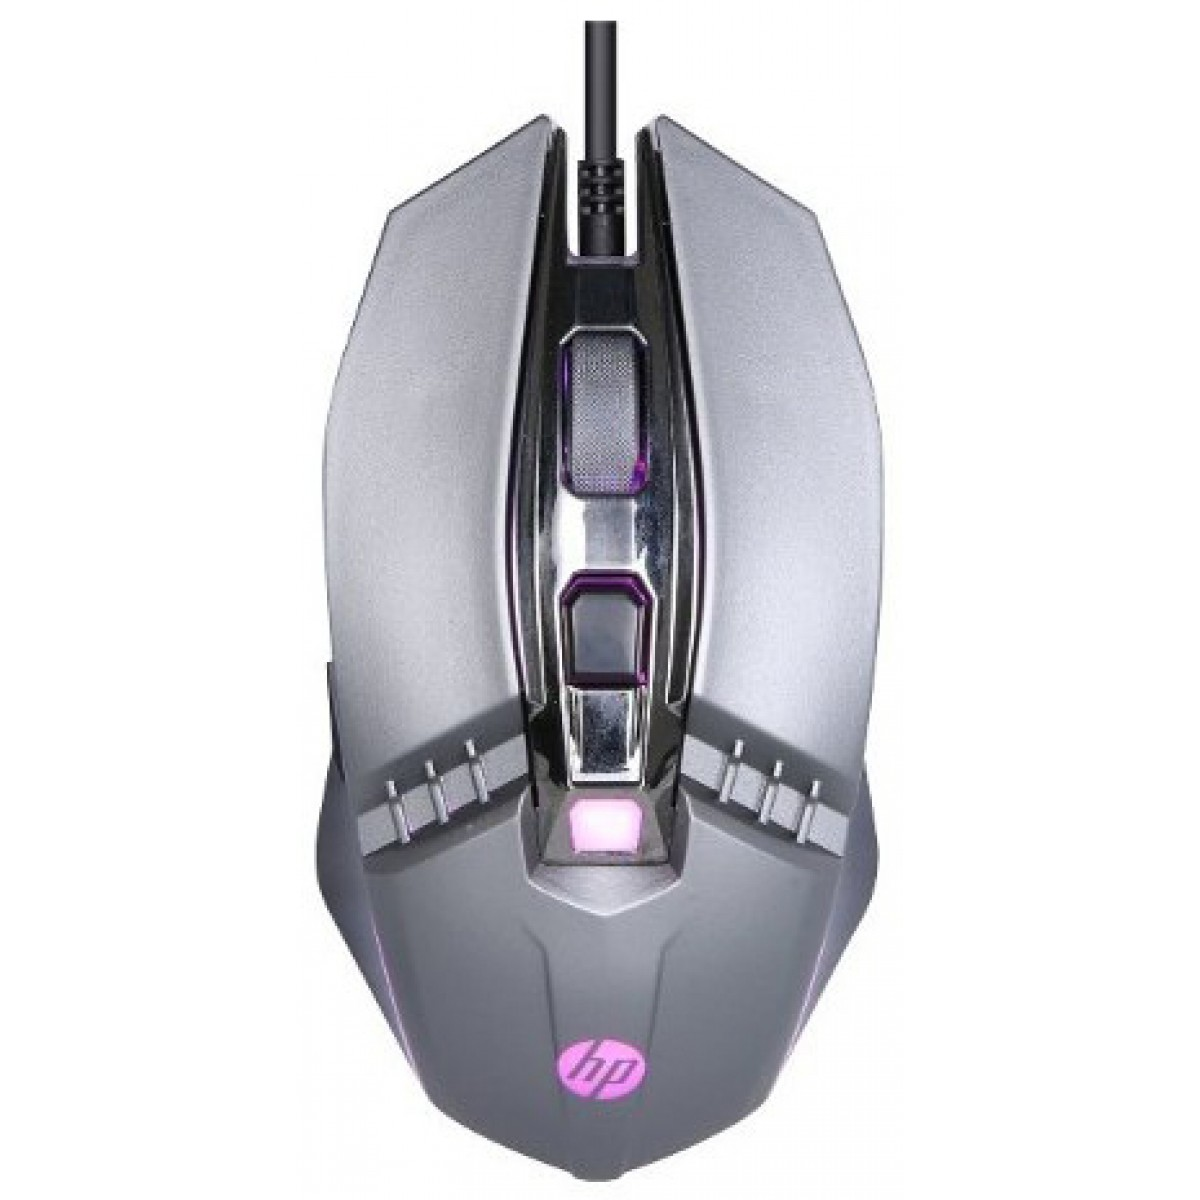 Mouse Gamer HP M270, 2400 DPI, 5 Botões, LED, Gray